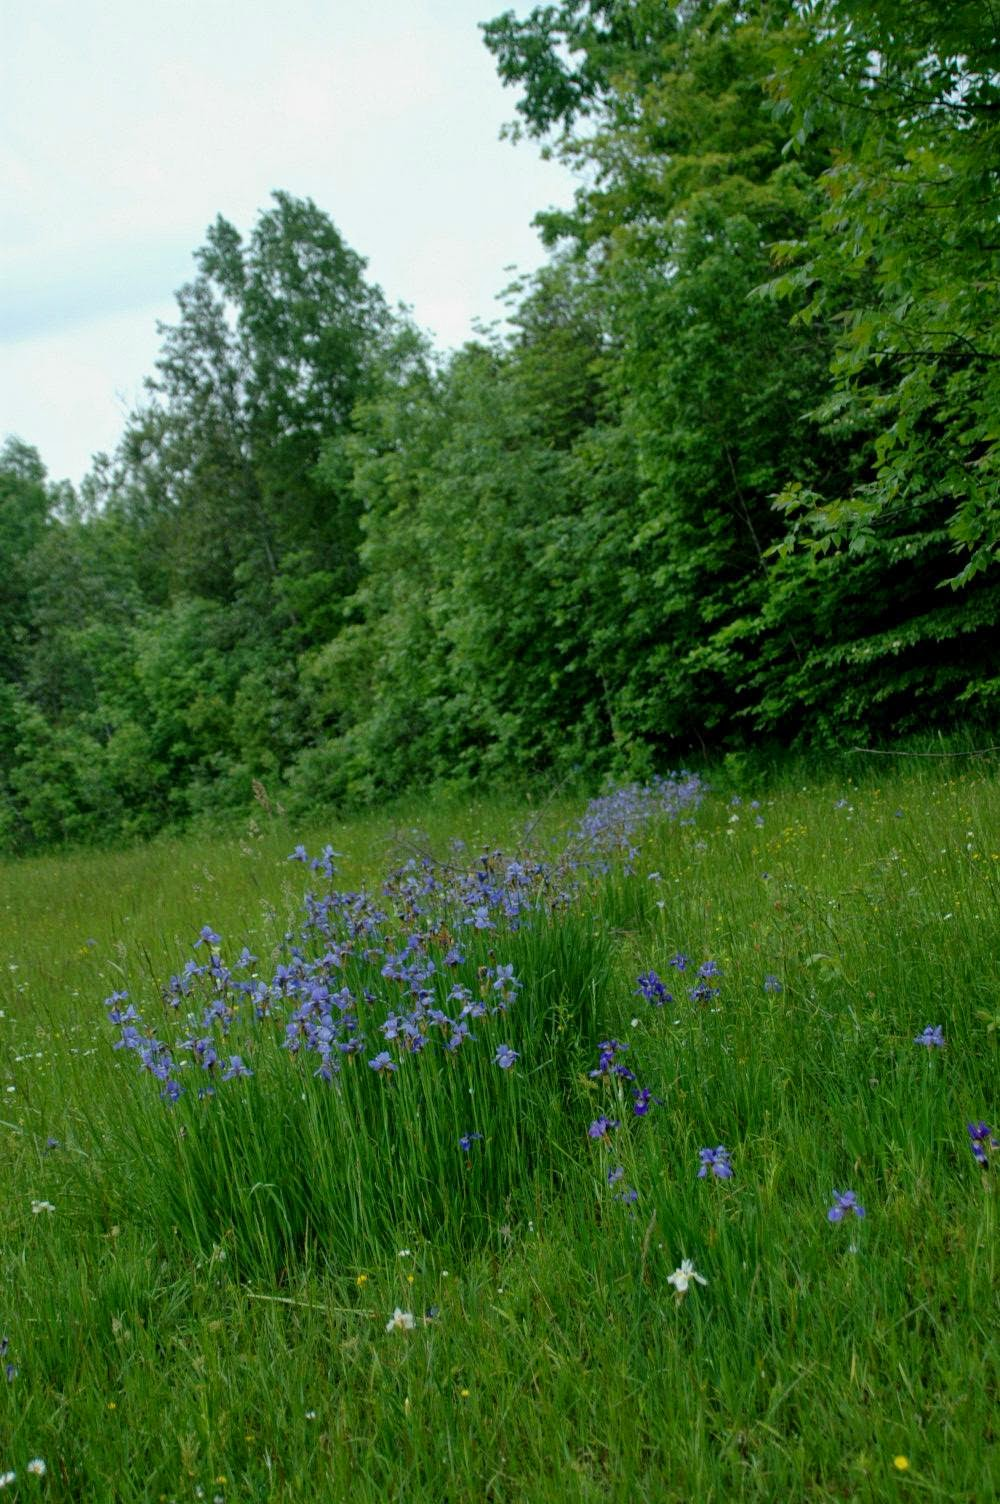 Naturalized Siberian irises